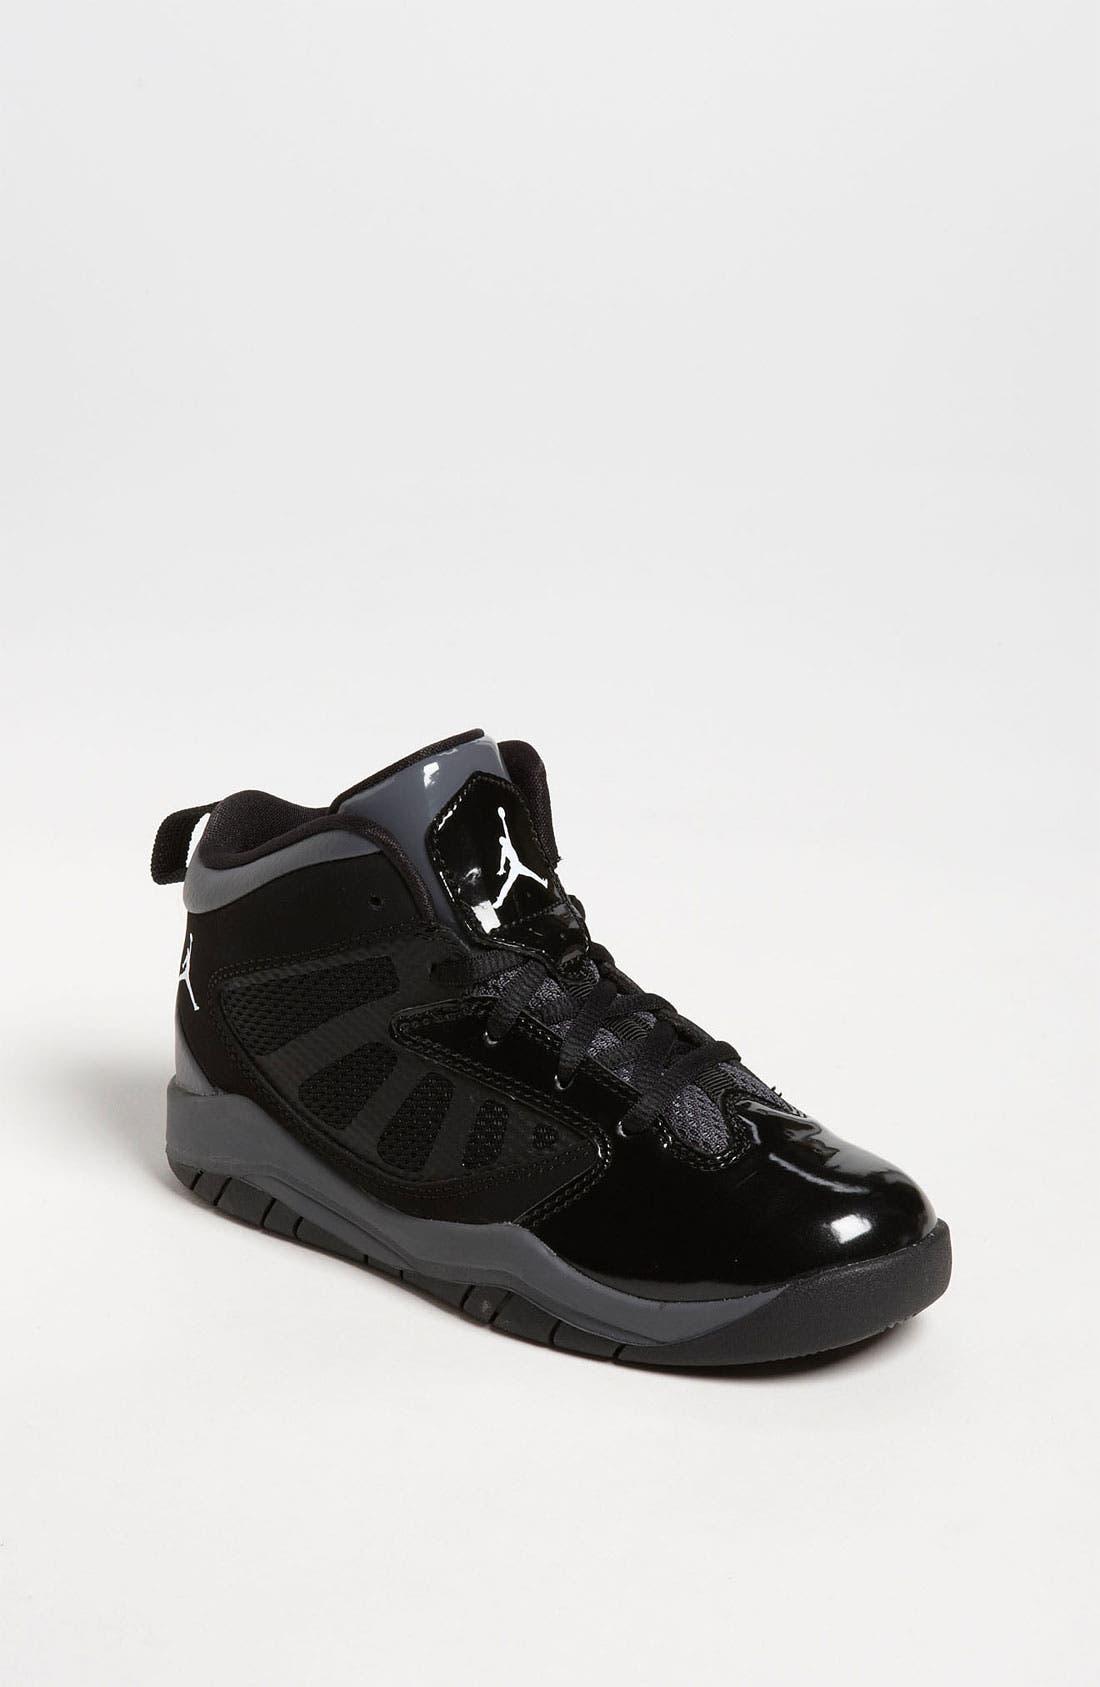 Main Image - Nike 'Jordan Flight Team 11' Basketball Shoe (Toddler & Little Kid)